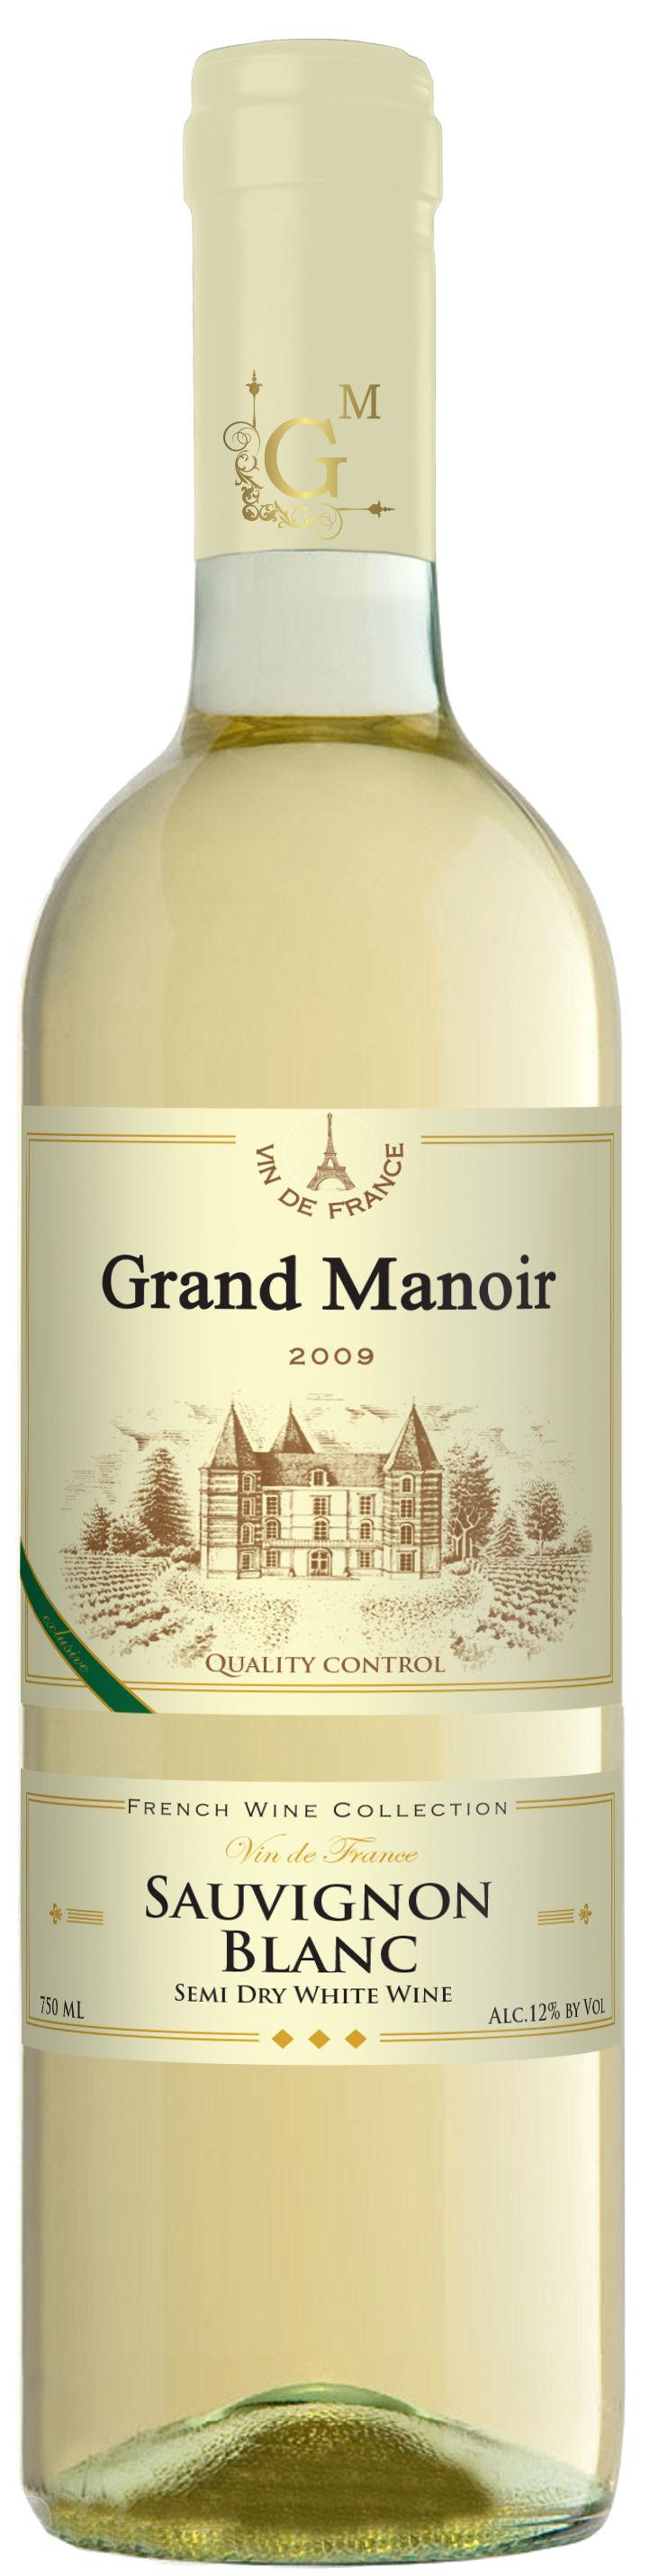 Grand Manoir Sauvignon Blanc s